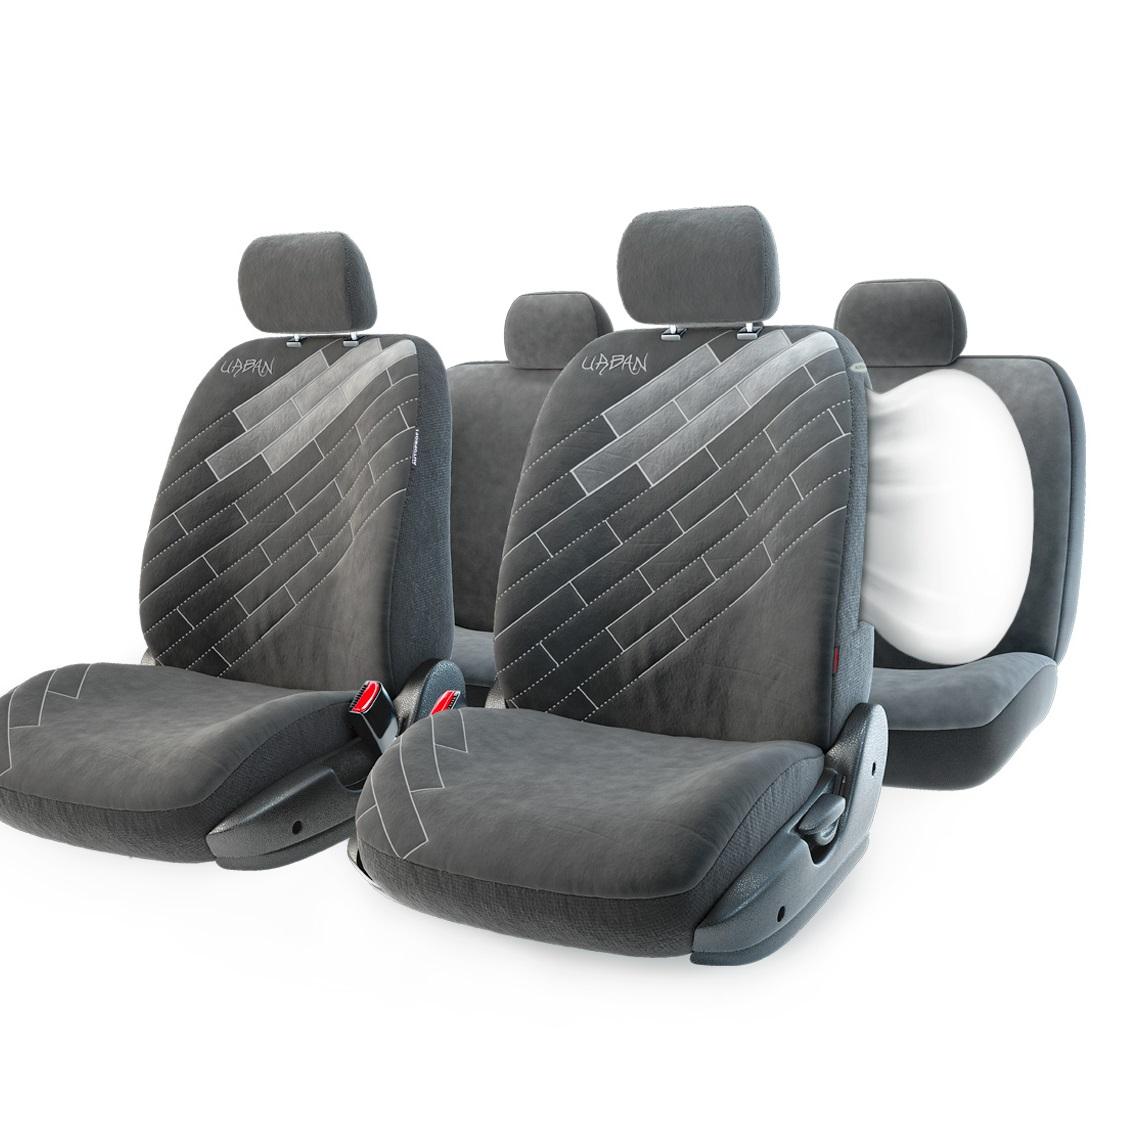 Чехол на сиденье Autoprofi Urb-1105 bk (m) чехол на сиденье autoprofi mtx 1105 bk d gy m